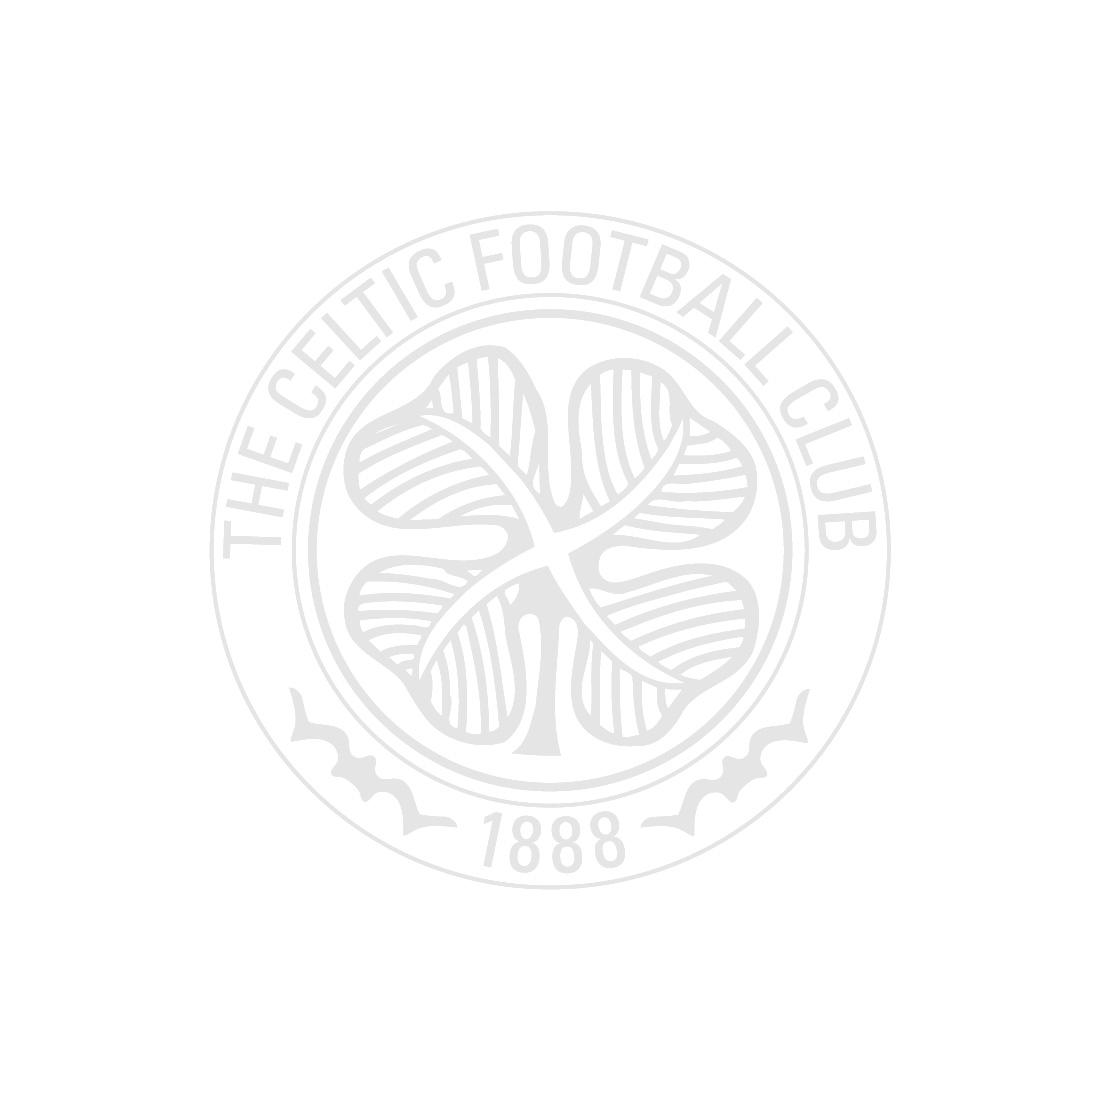 Celtic Father & Son Congratulations Card